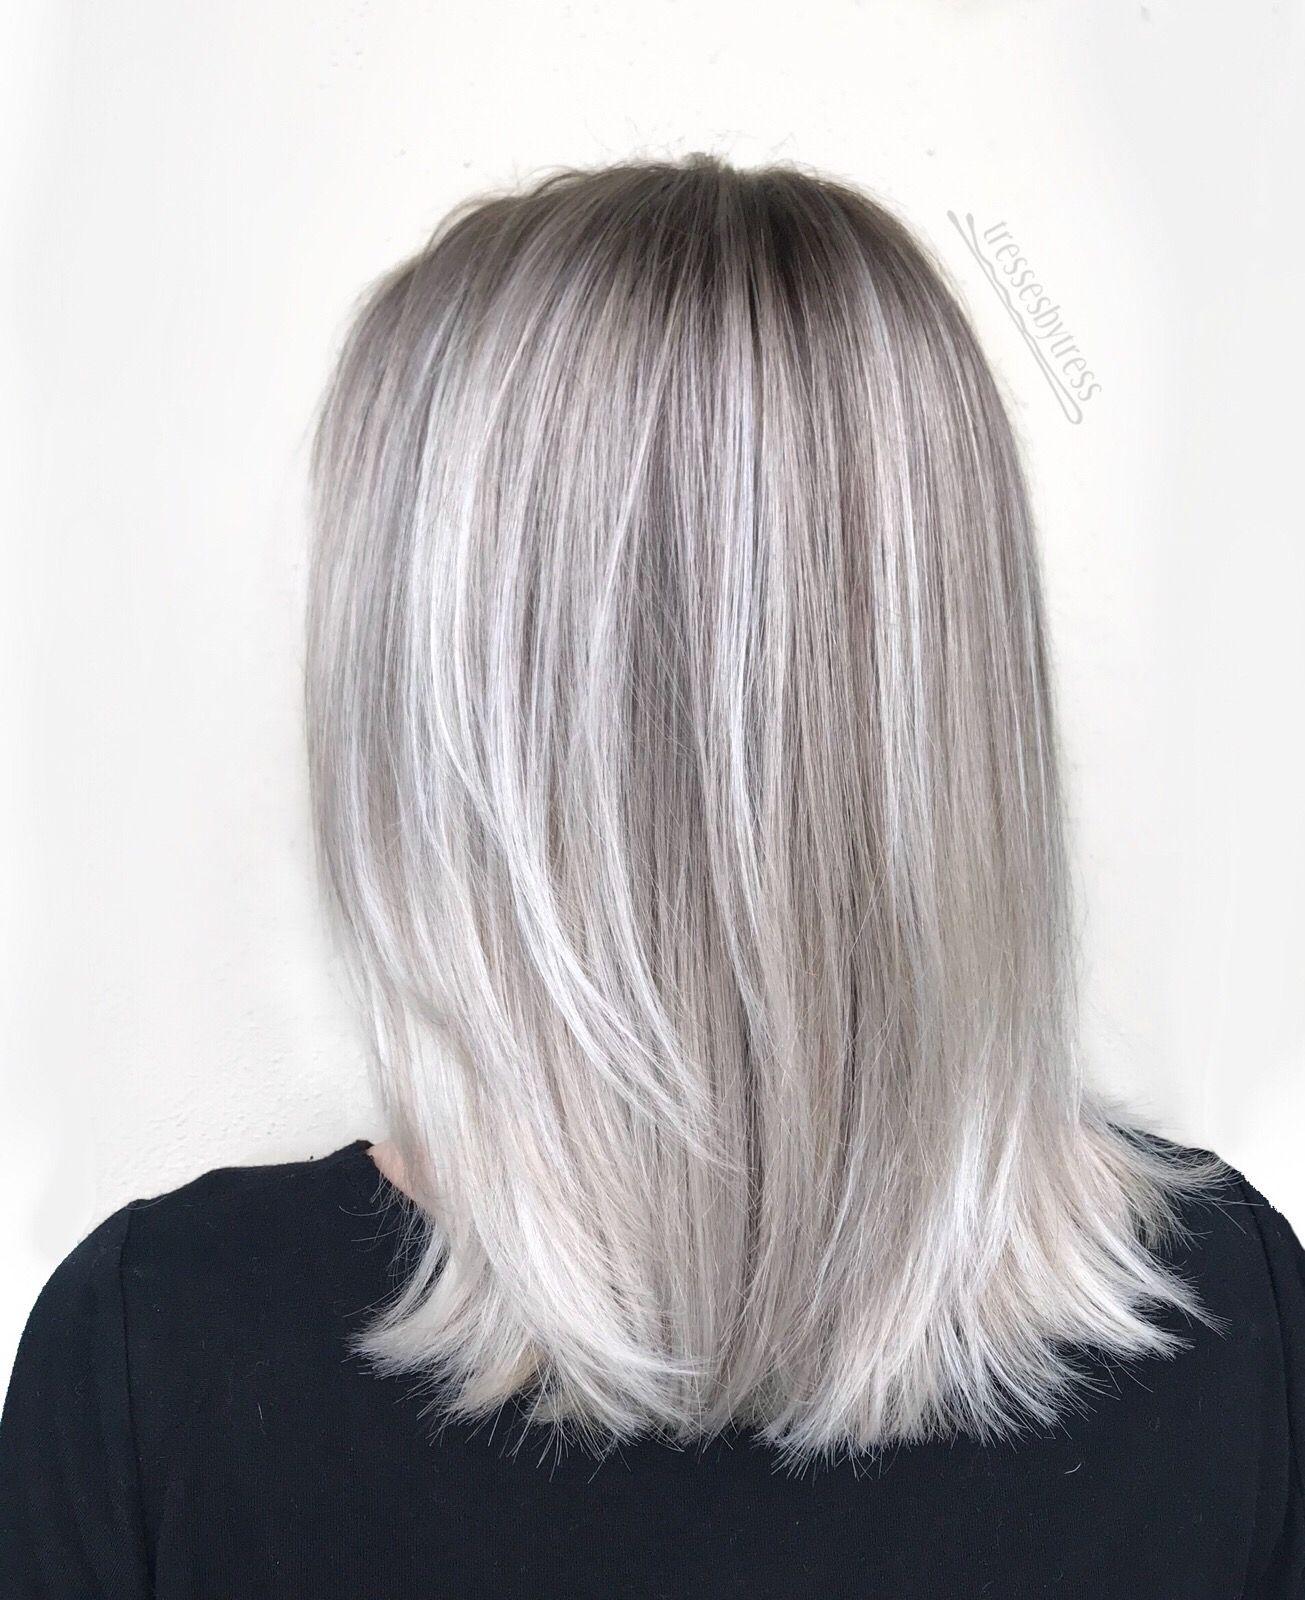 Icy White Platinum Blonde Balayage Lob Short Hair Balayage Hair Blonde Long Platinum Blonde Balayage Balayage Hair Blonde